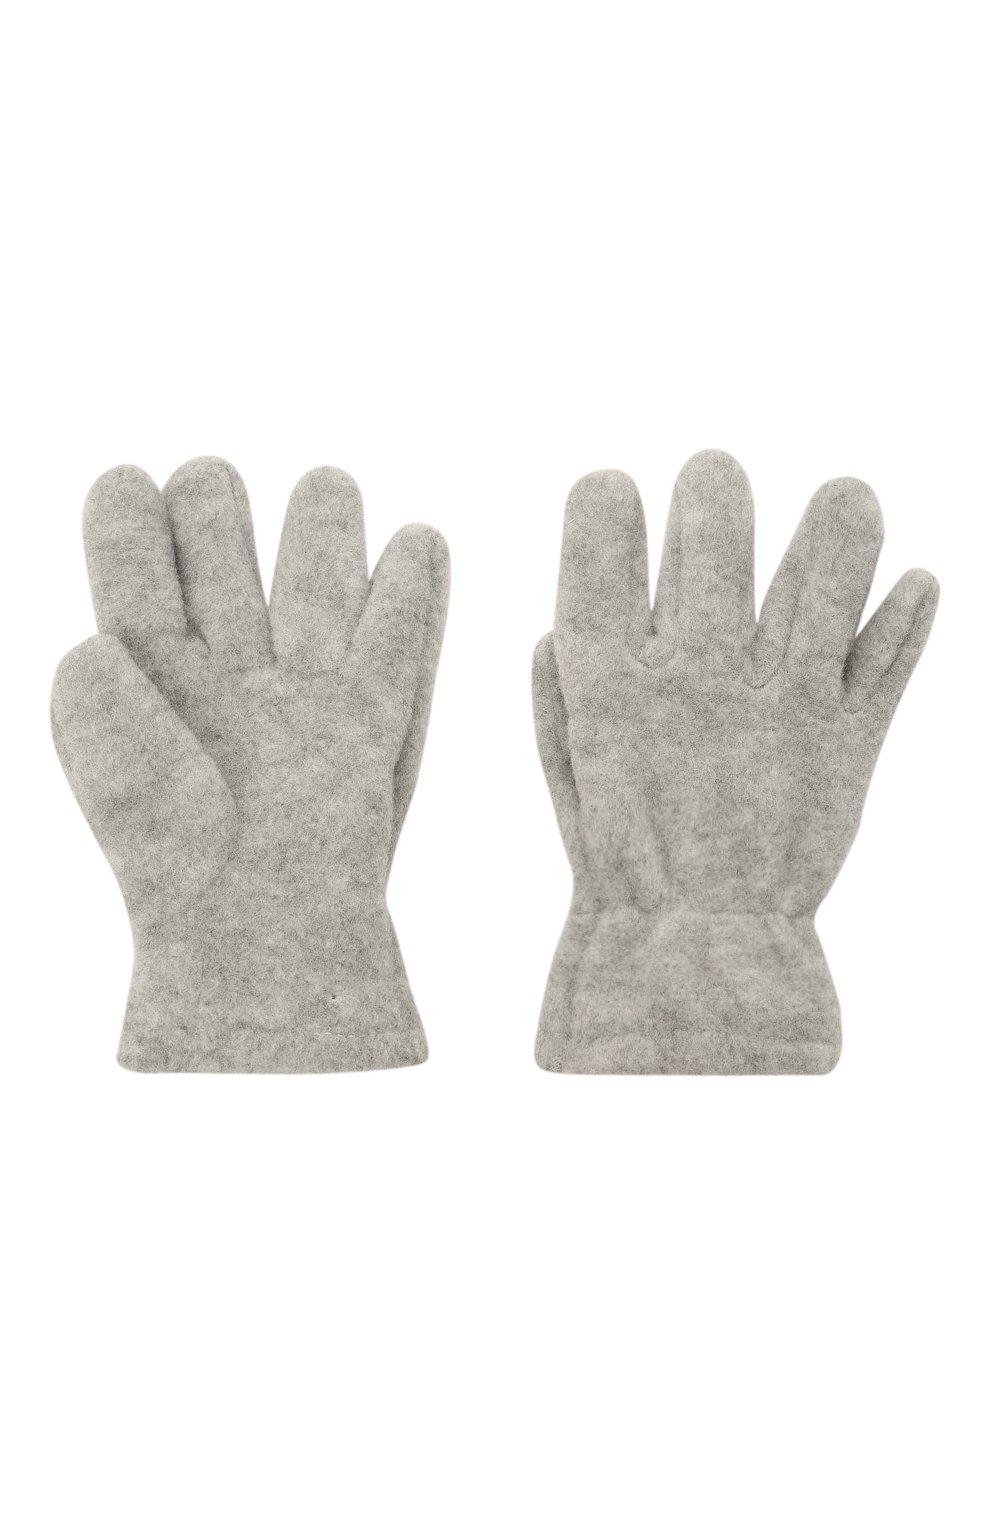 Детские перчатки CATYA серого цвета, арт. 125543 | Фото 2 (Материал: Текстиль, Синтетический материал)